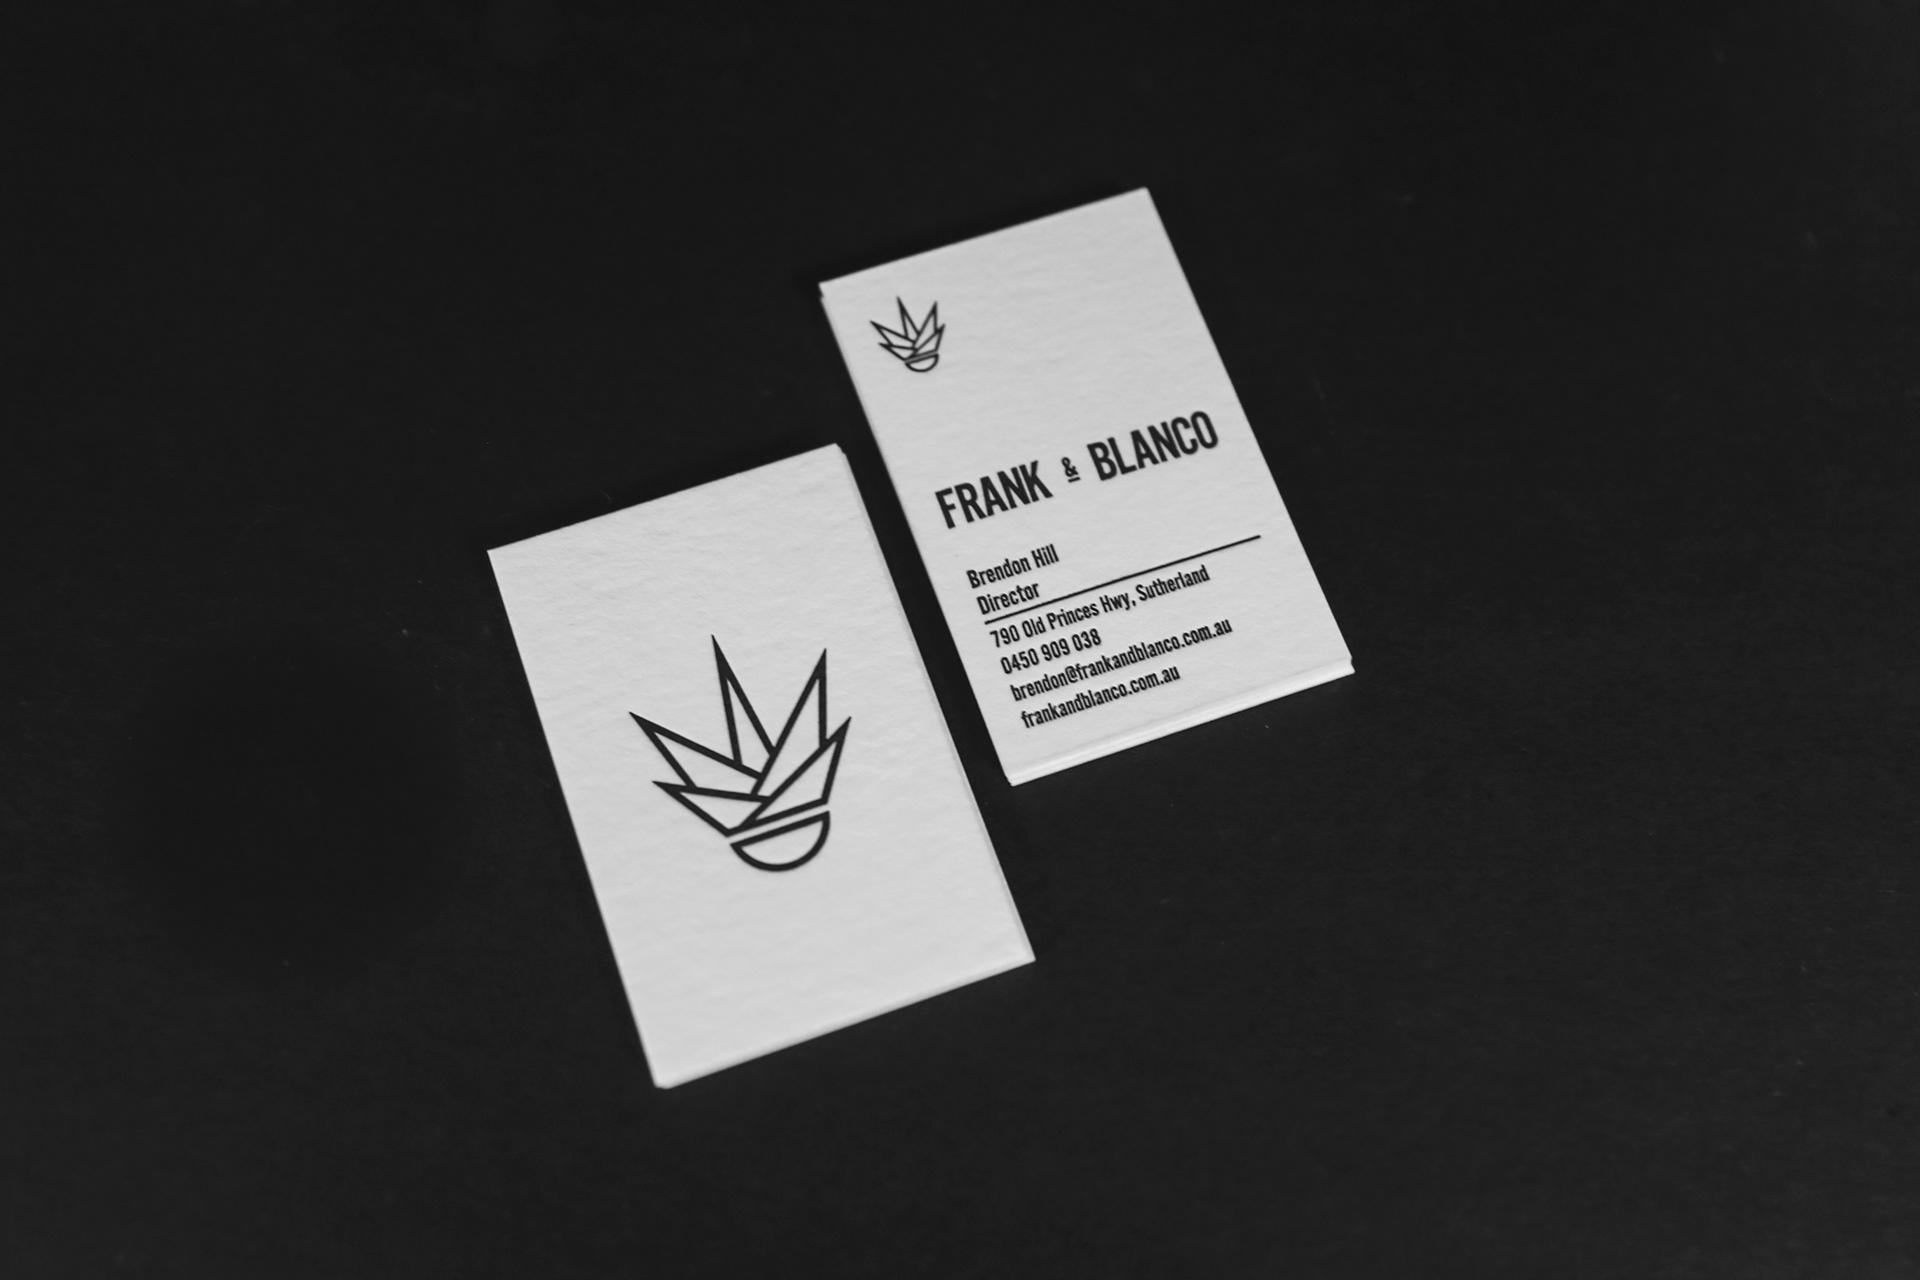 Luke Tuxford - Frank & Blanco